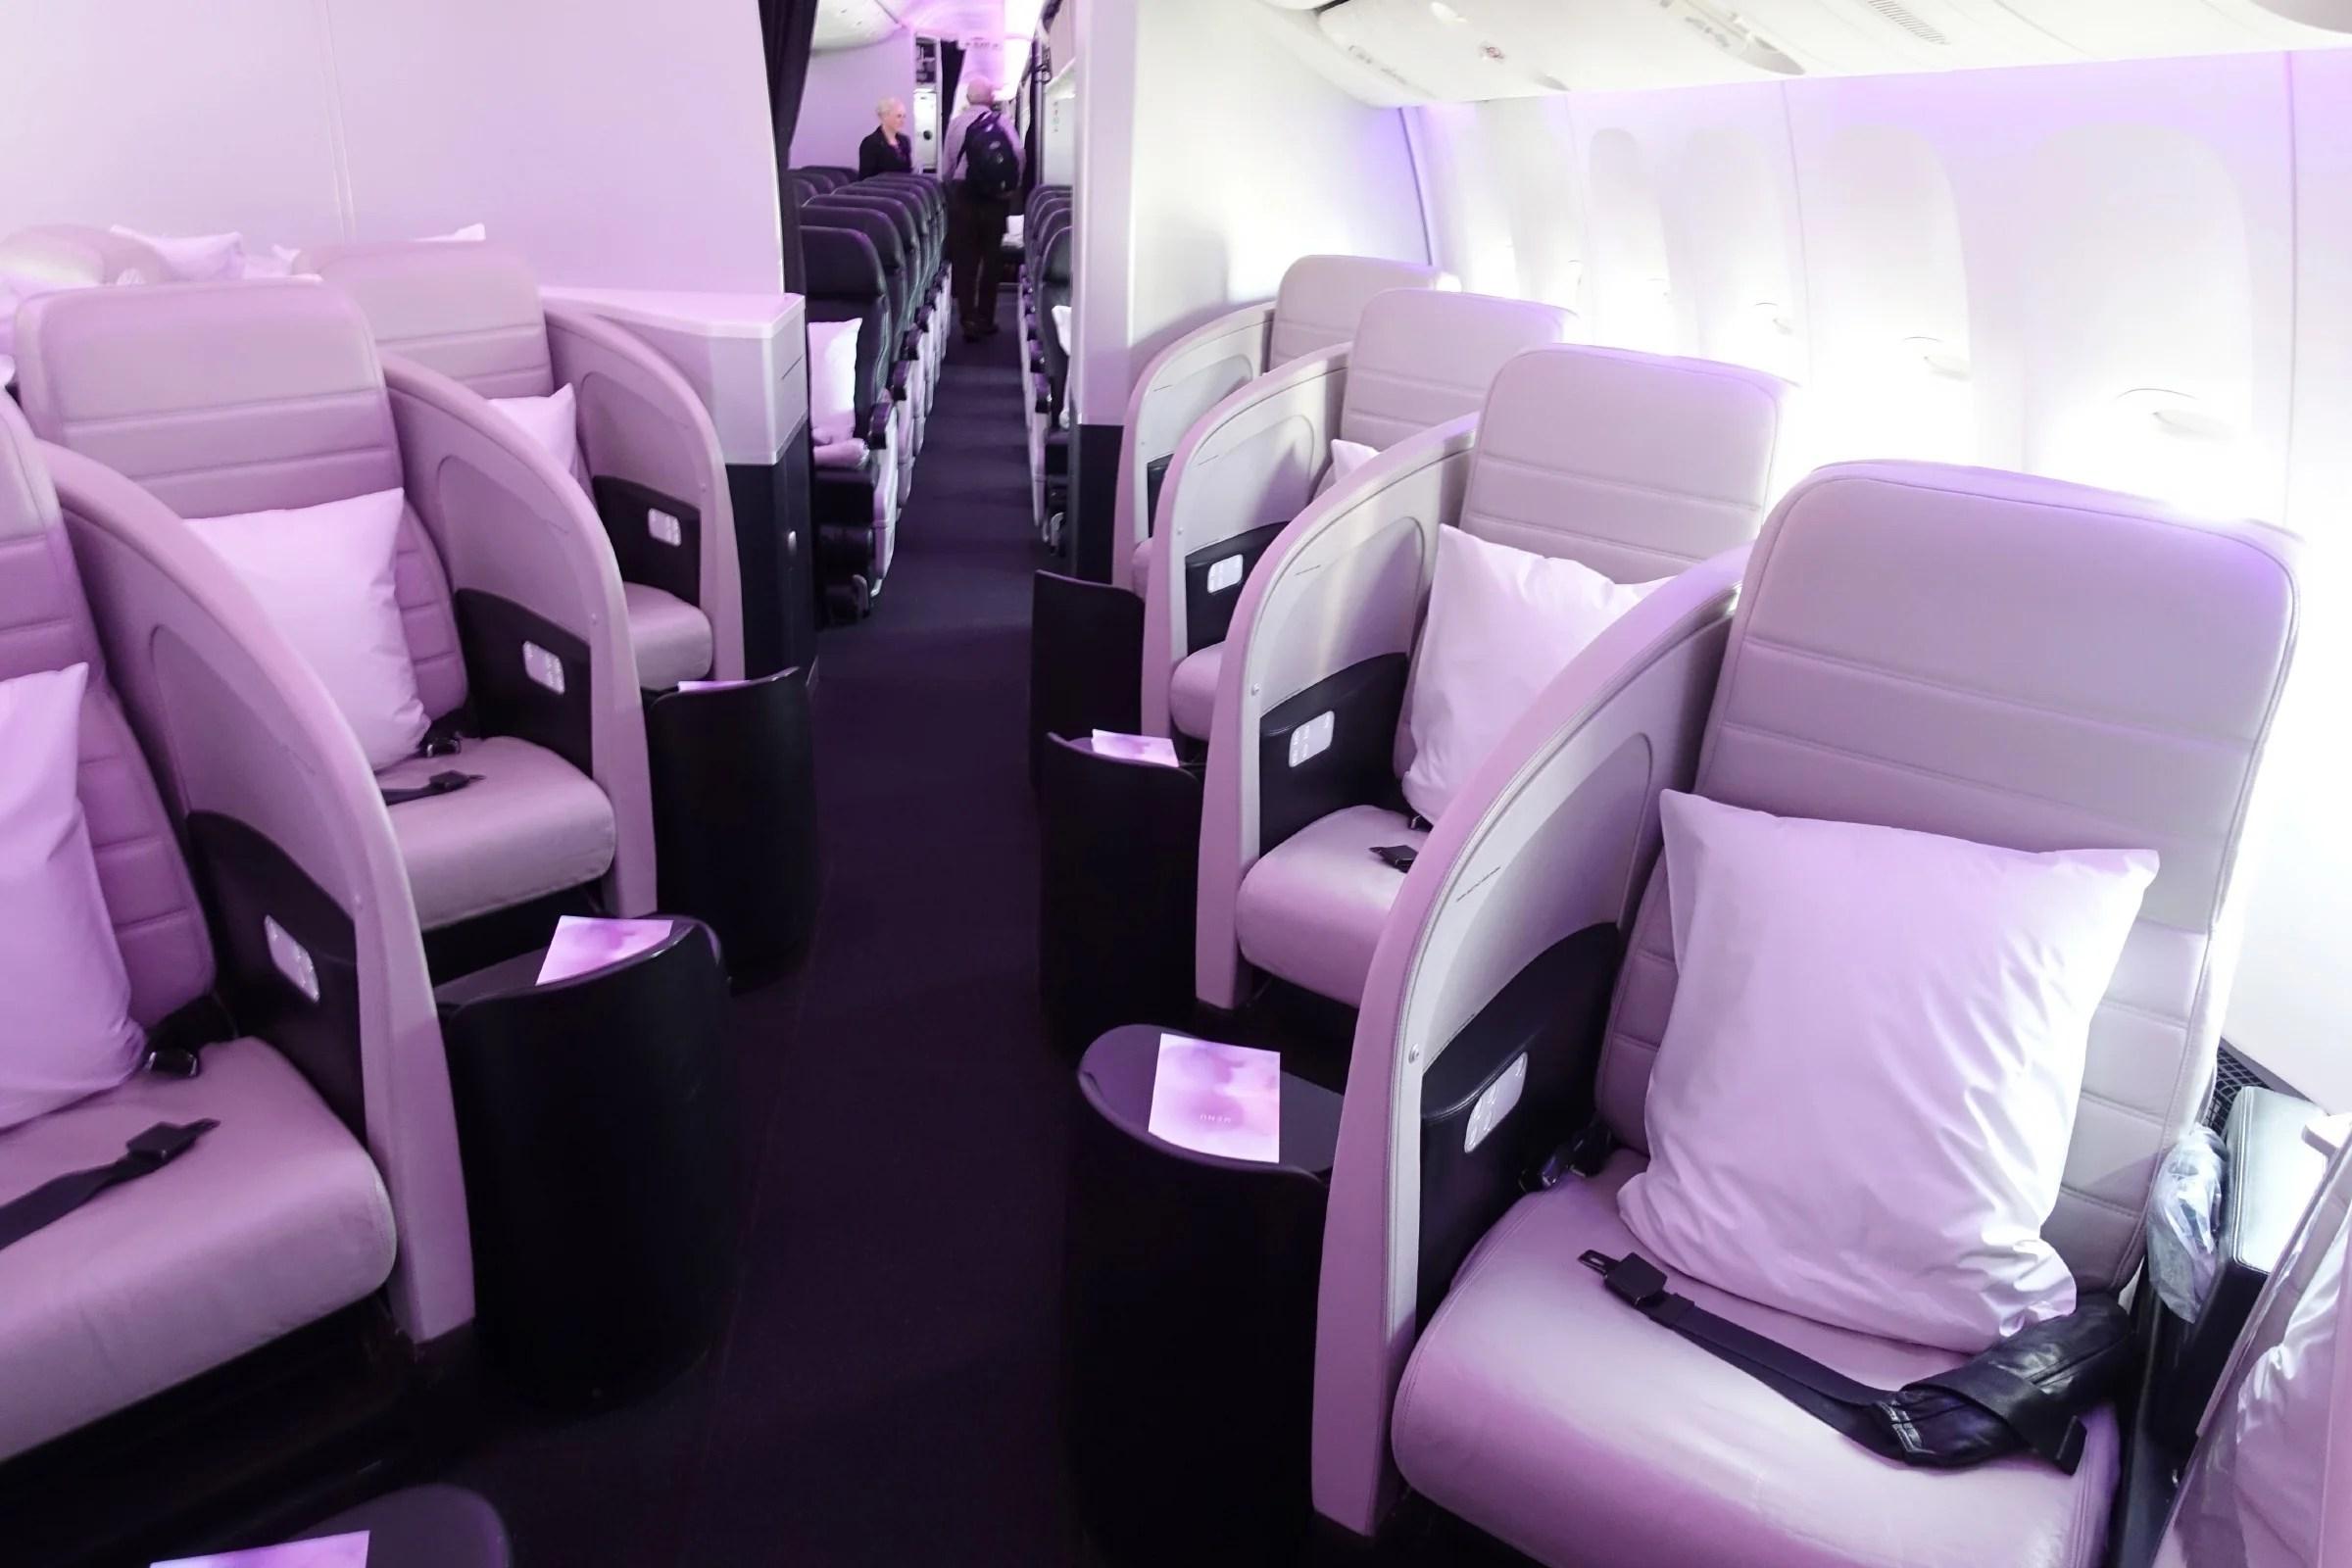 Deal Alert: Rare Air New Zealand Business Class Award Space From Just 49,000 Points Each Way